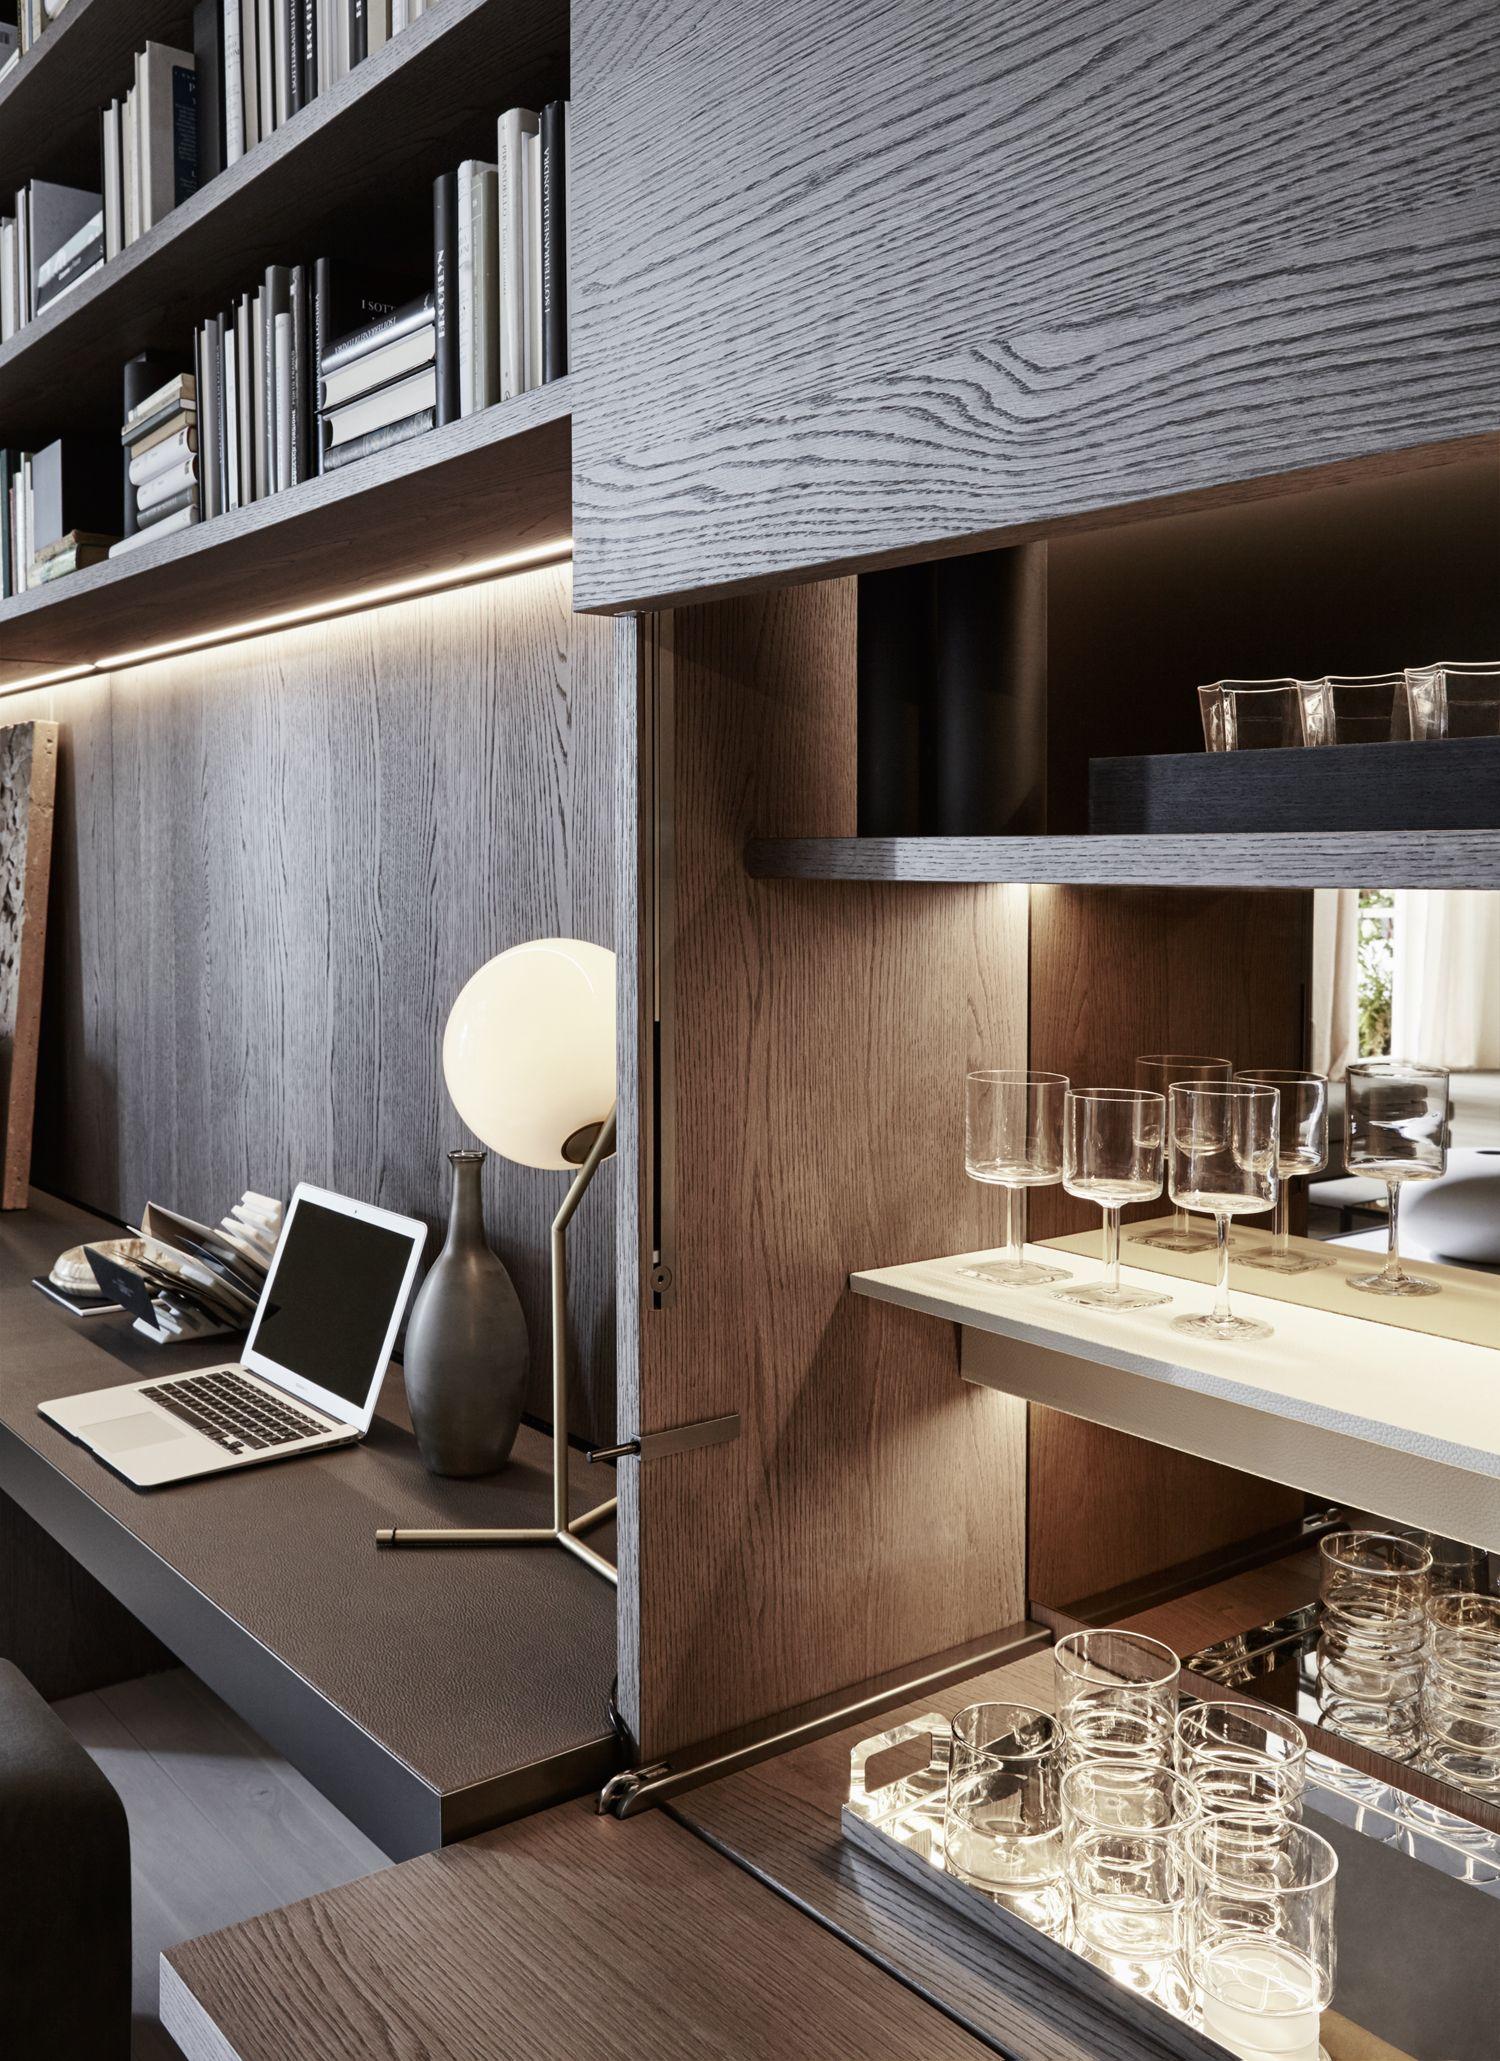 Paneles boiserie y barras de iluminaci n led interiores for Muebles para estudio